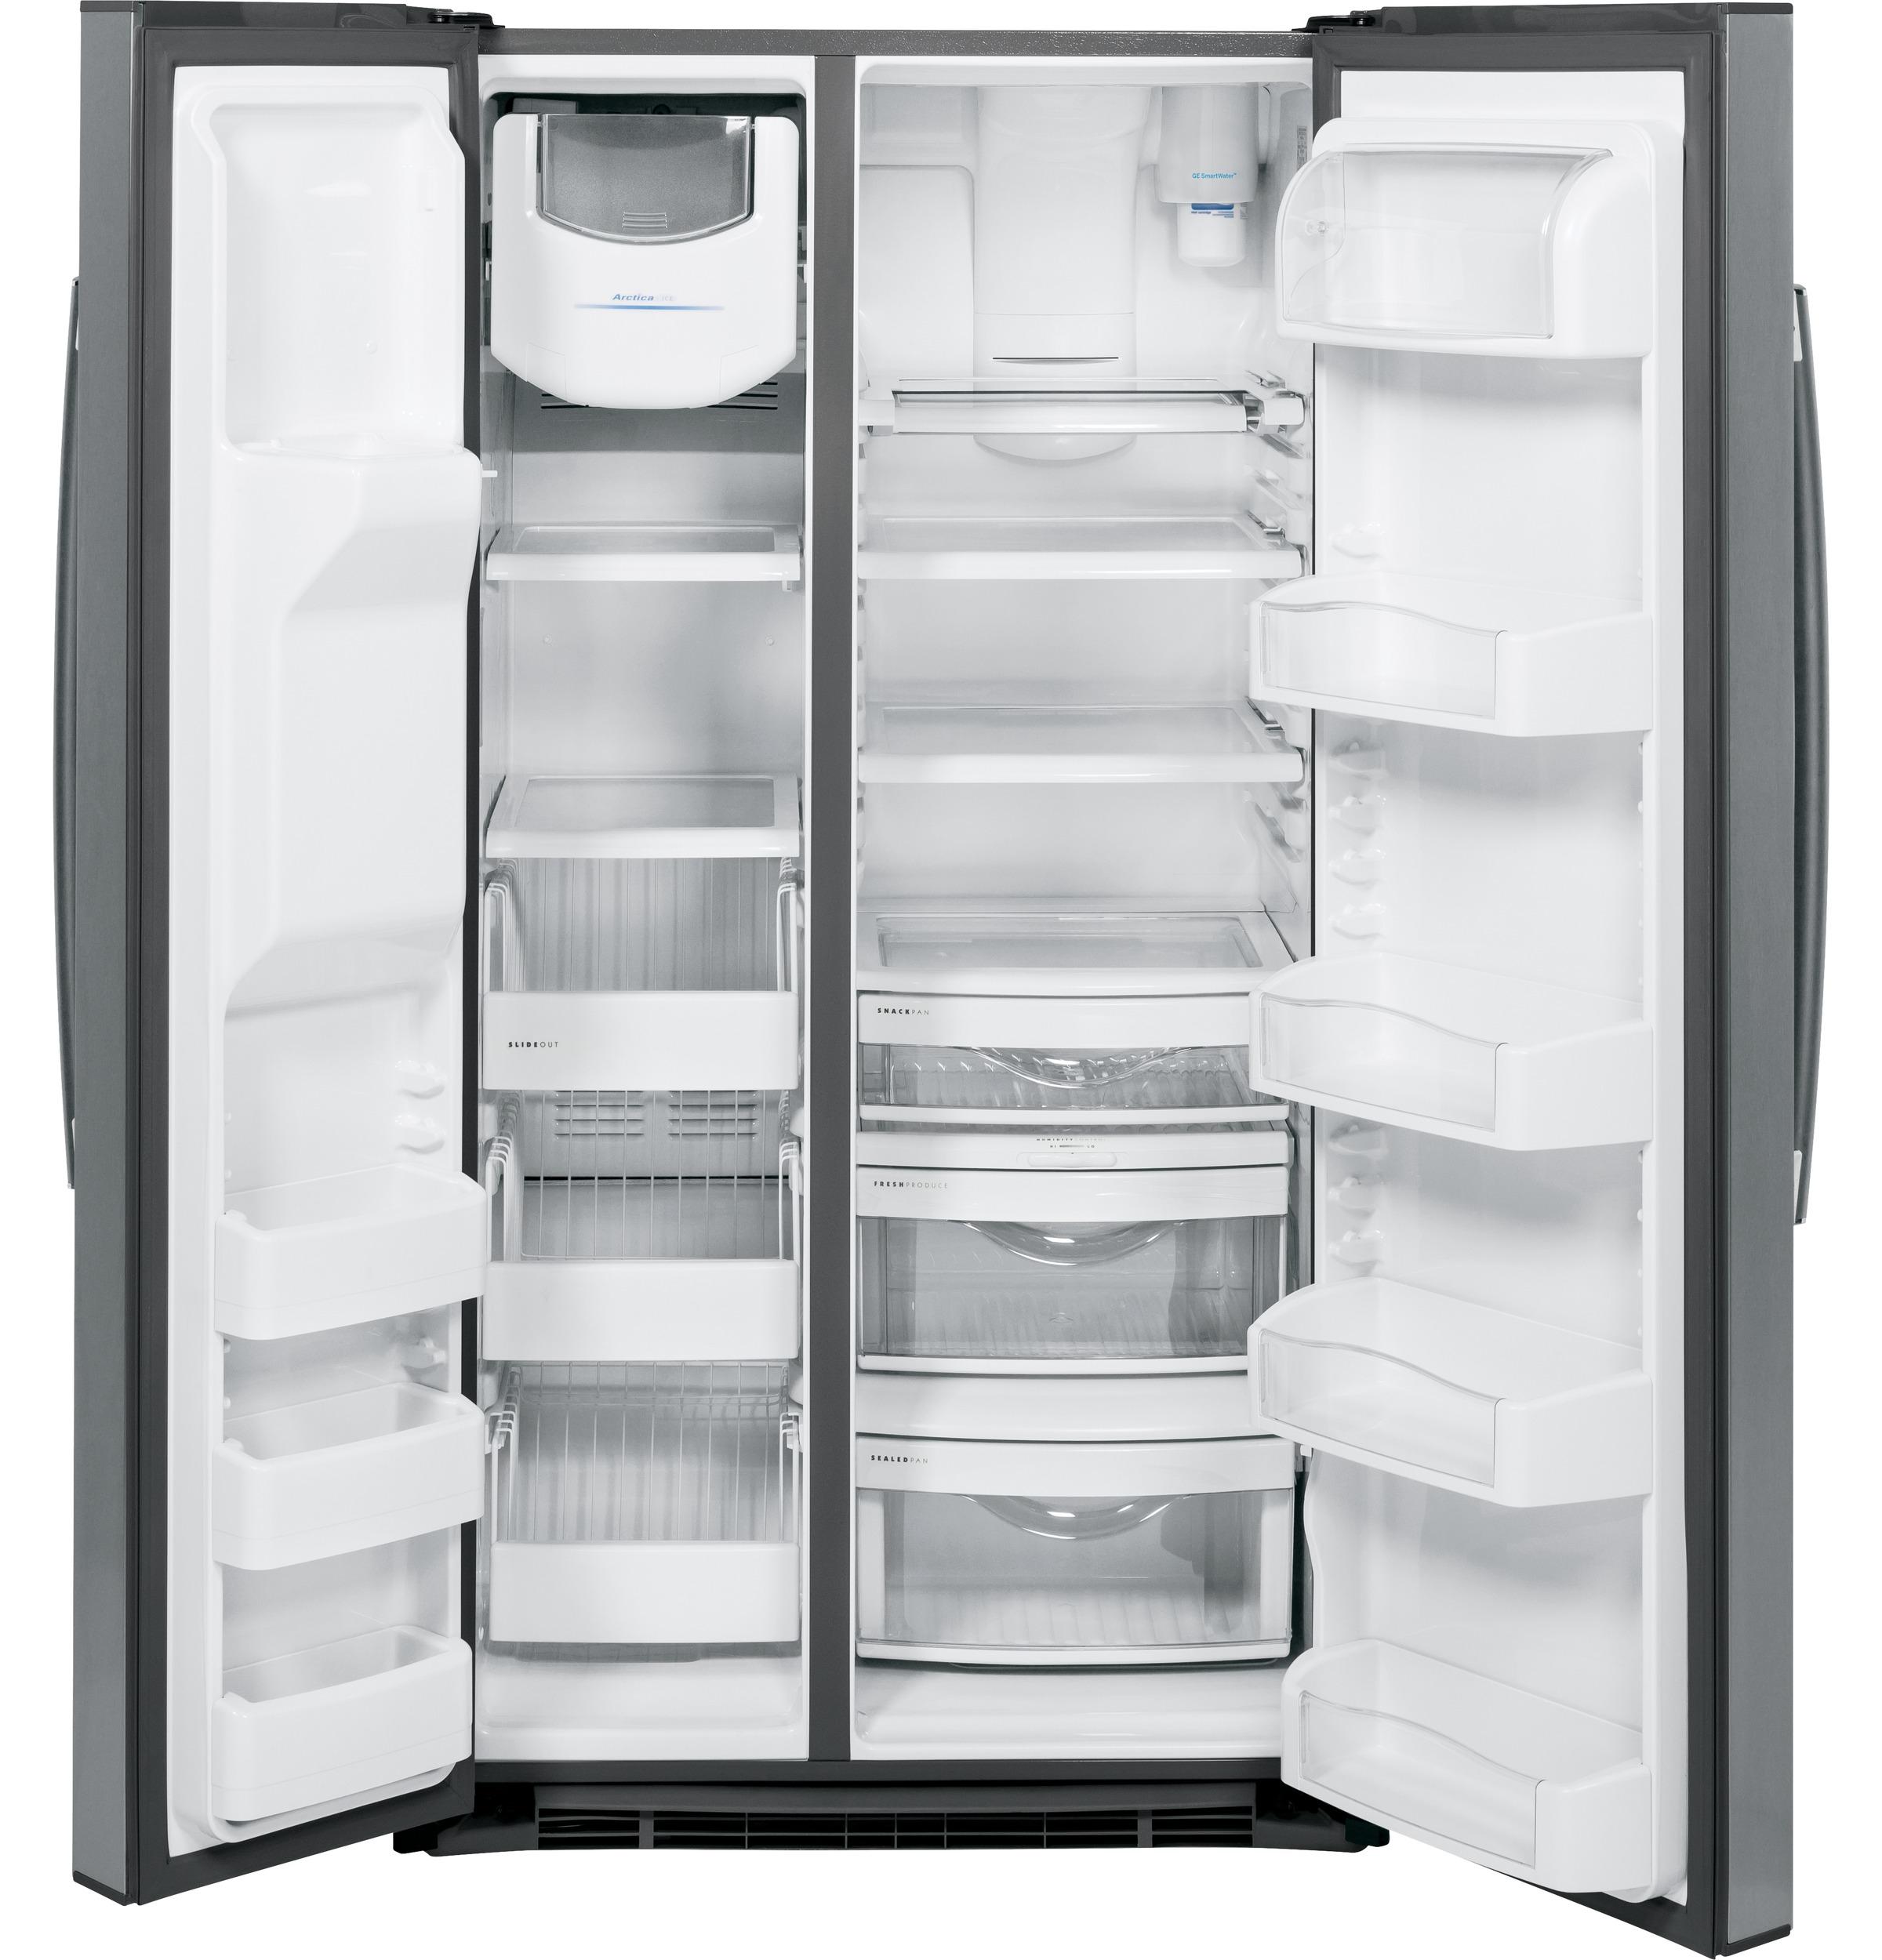 Model: PSE25KSHSS | GE Profile™ Series ENERGY STAR® 25.3 Cu. Ft. Side-by-Side Refrigerator